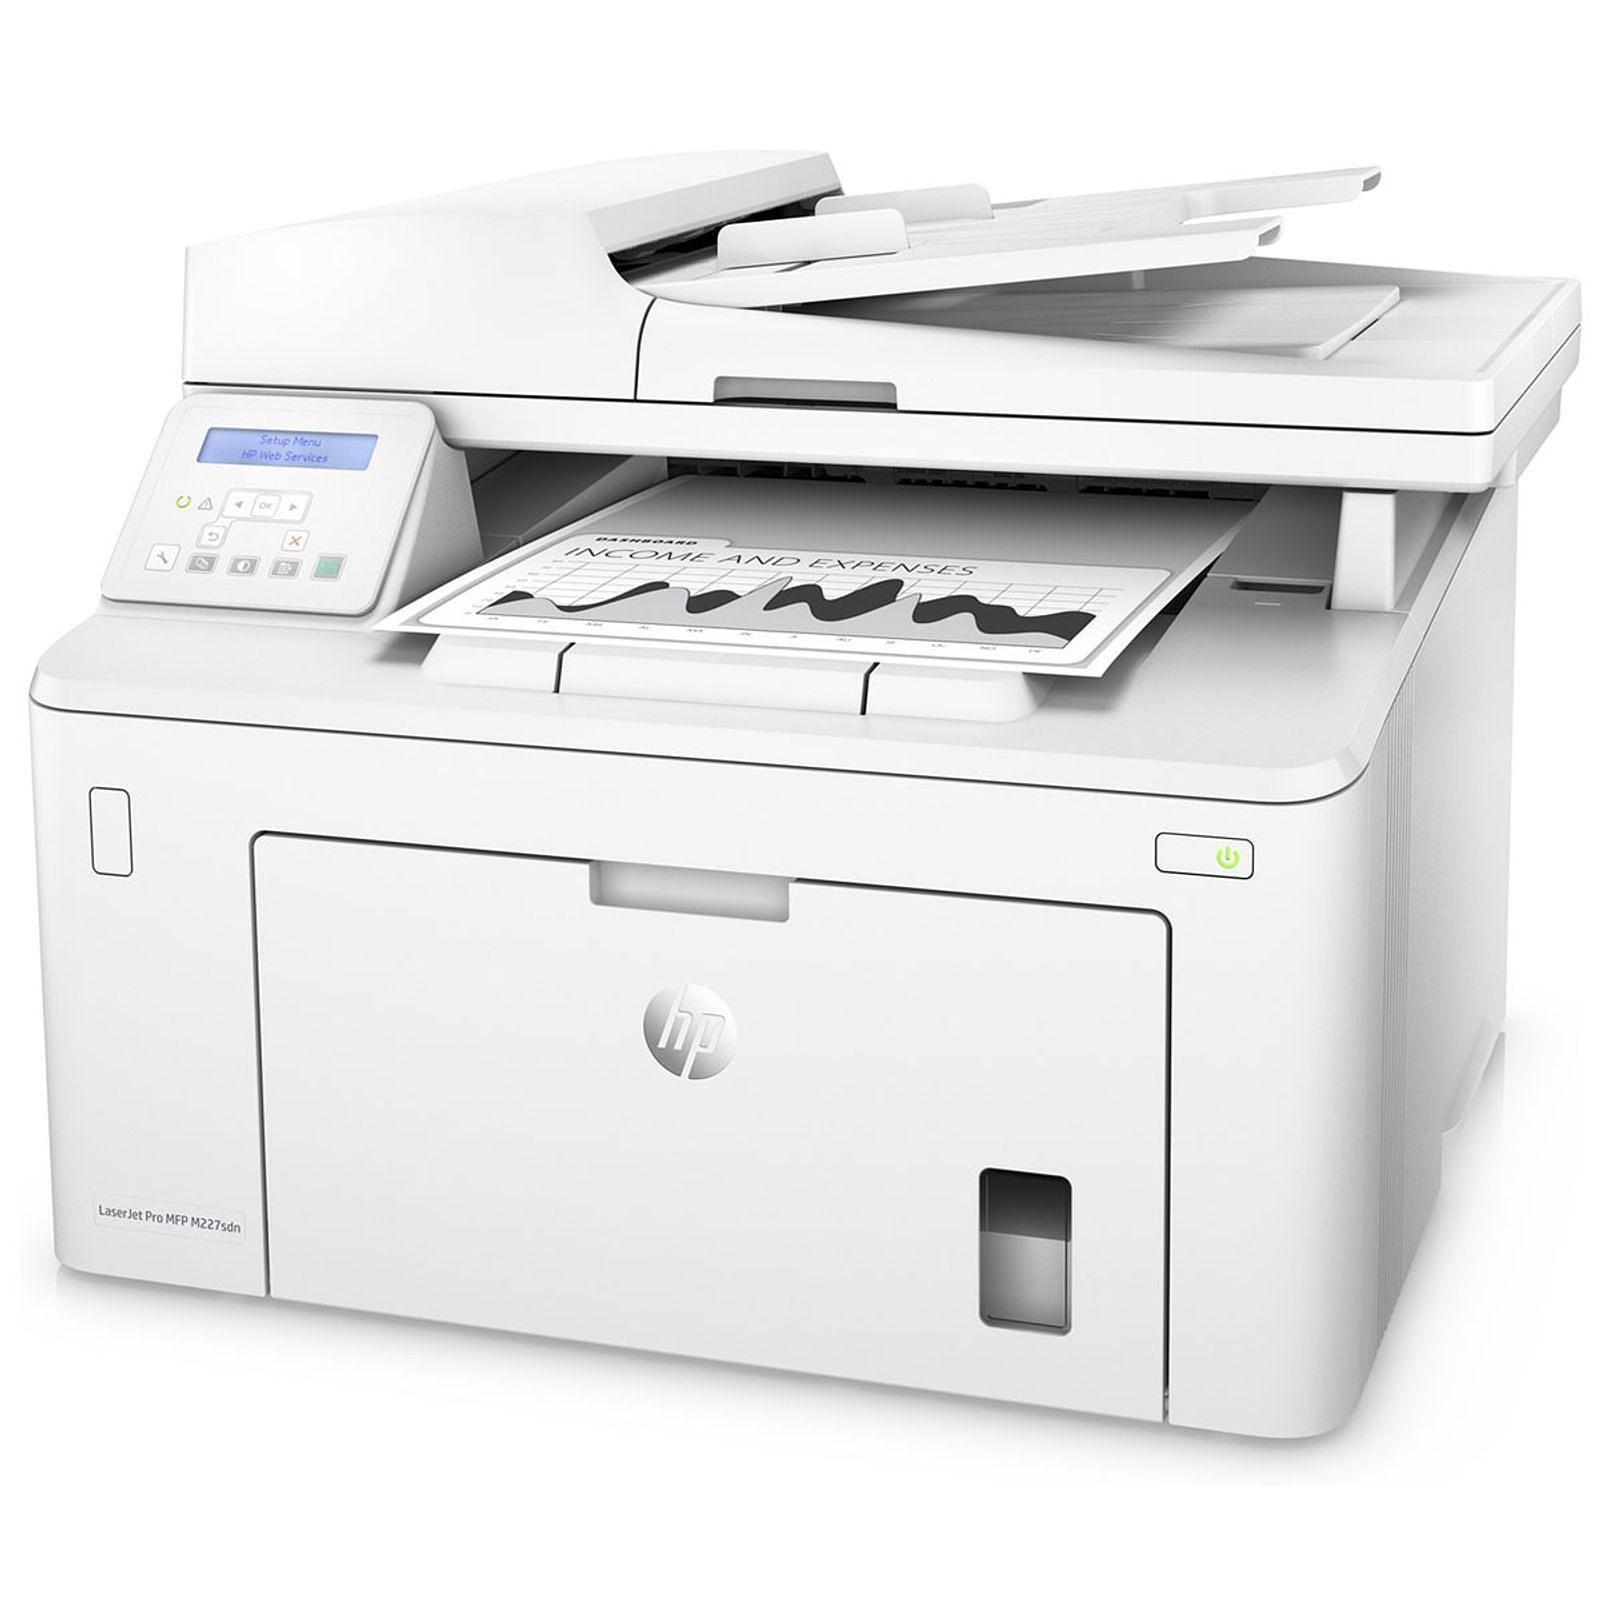 Imprimante multifonction HP LaserJet Pro MFP M227sdn - Cybertek.fr - 3